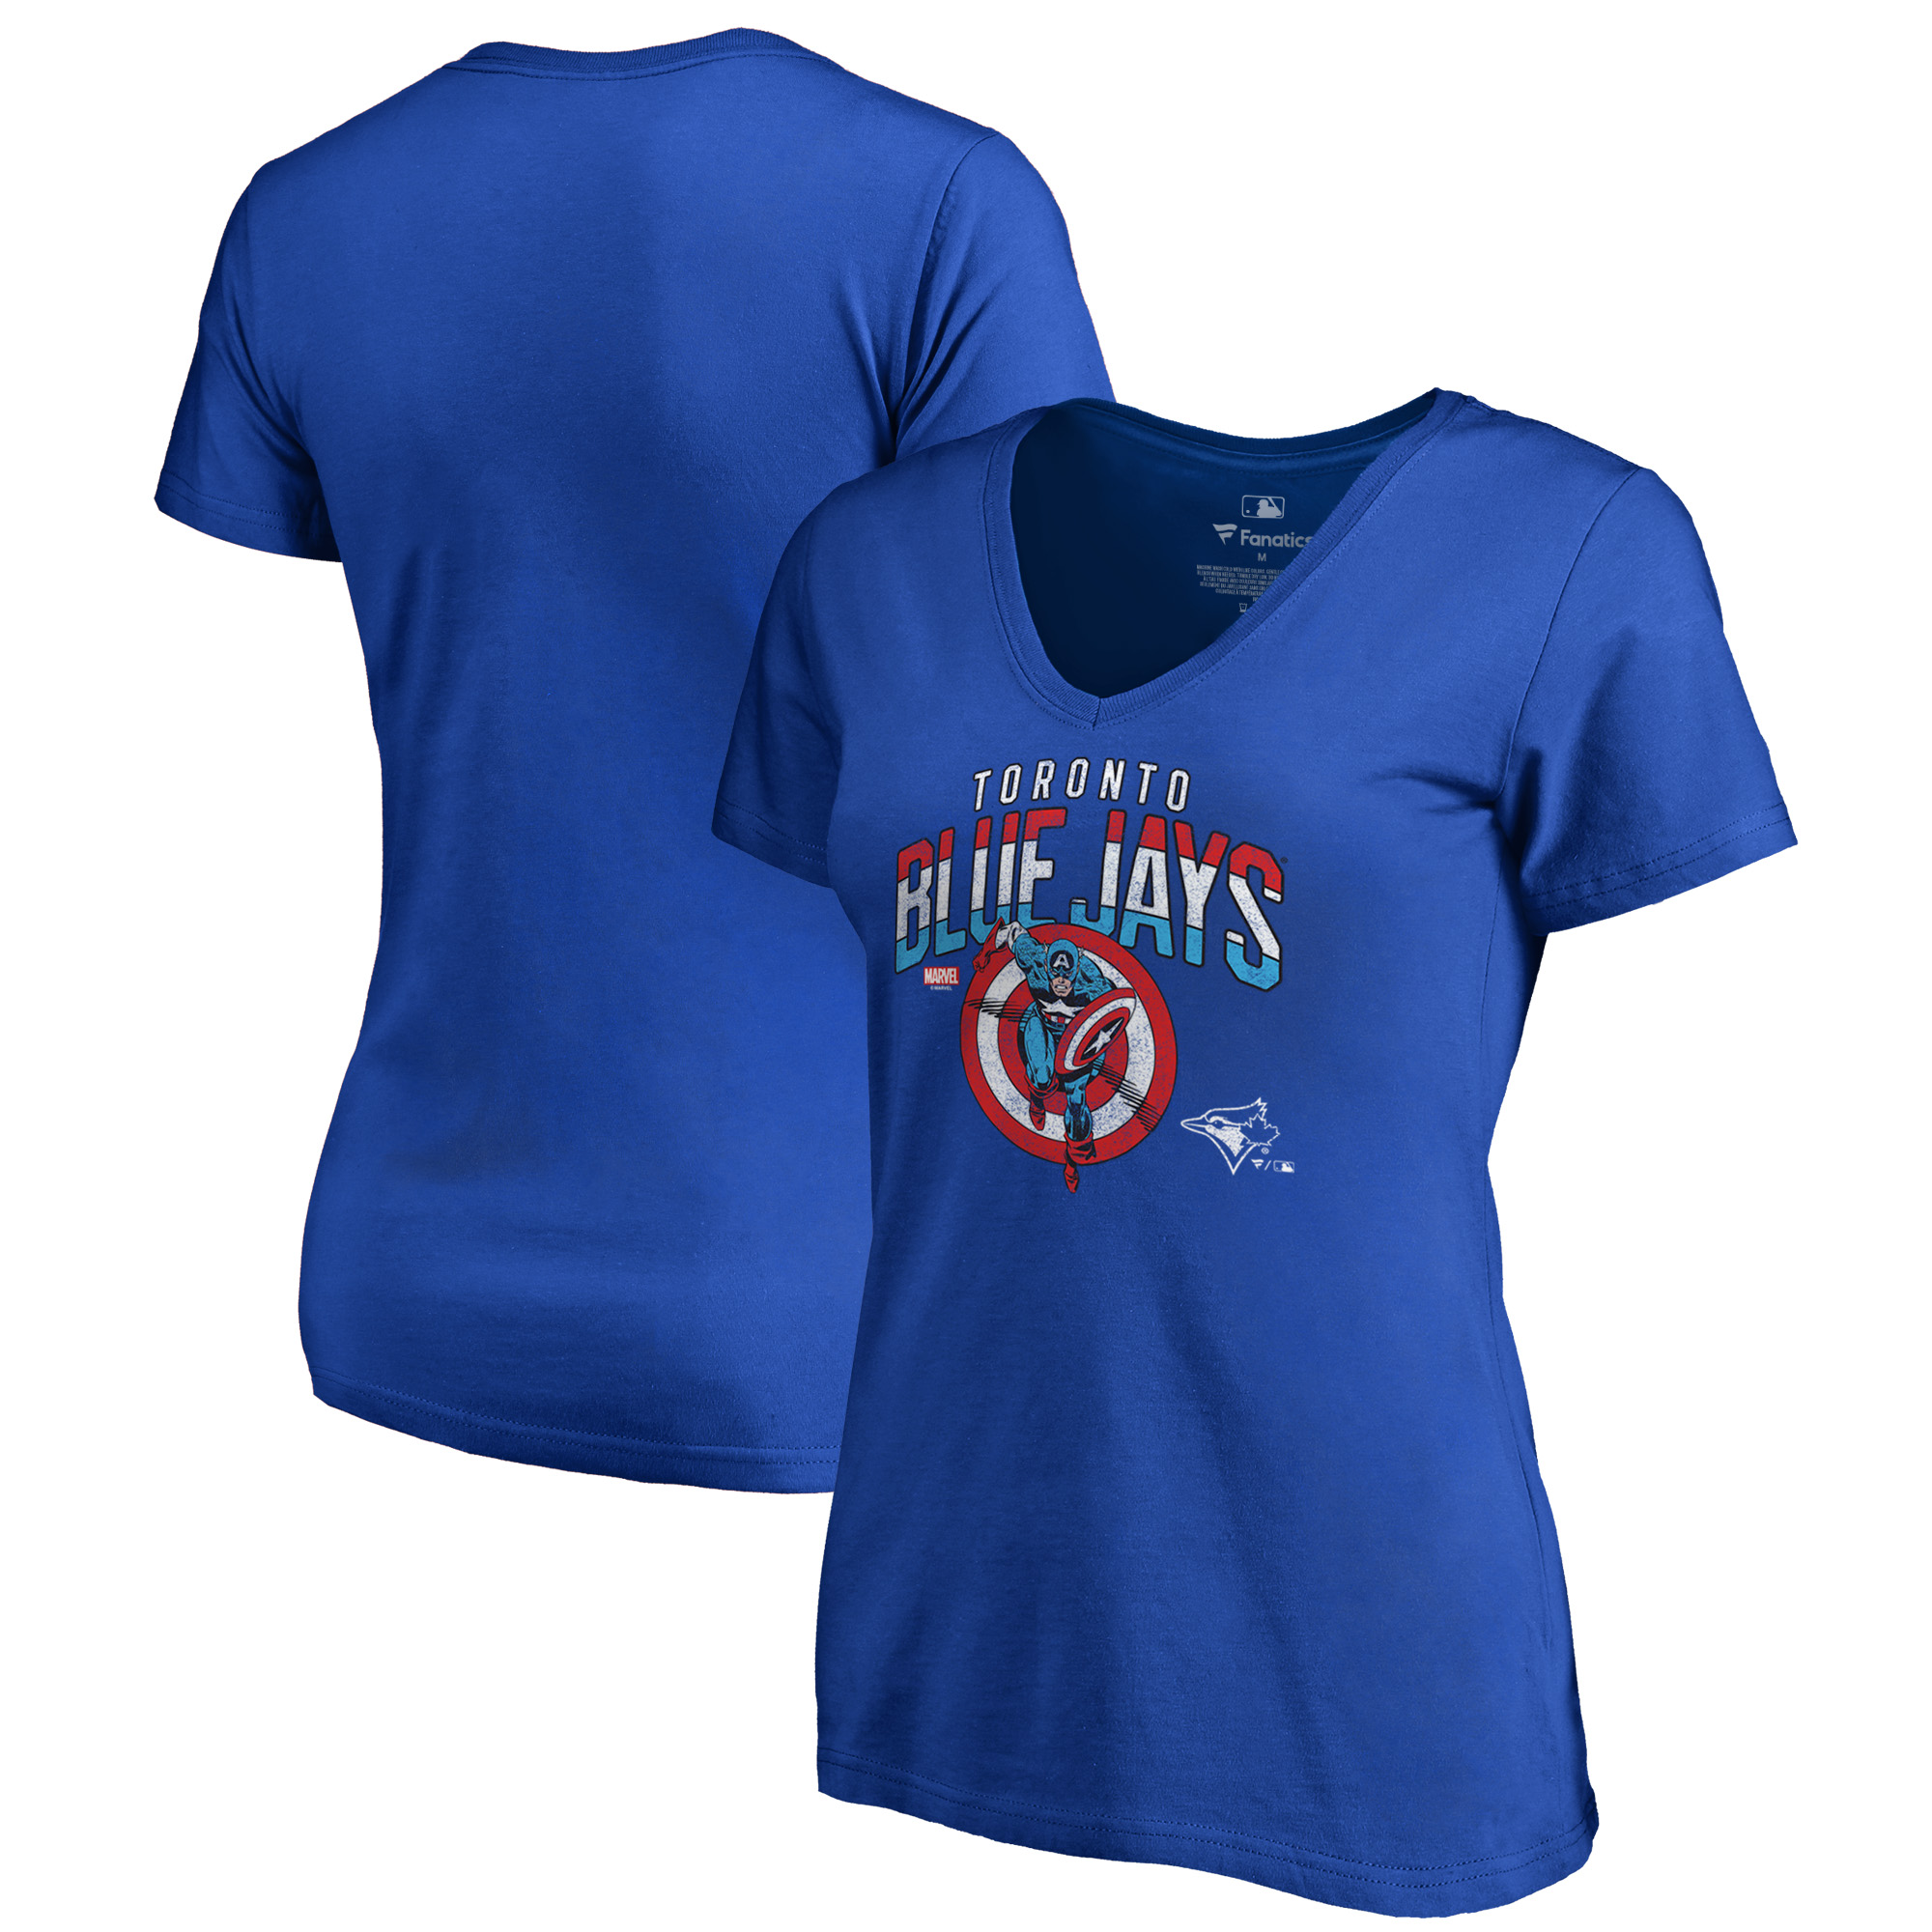 Toronto Blue Jays Fanatics Branded Women's MLB Marvel Captain's Shield V-Neck T-Shirt - Royal